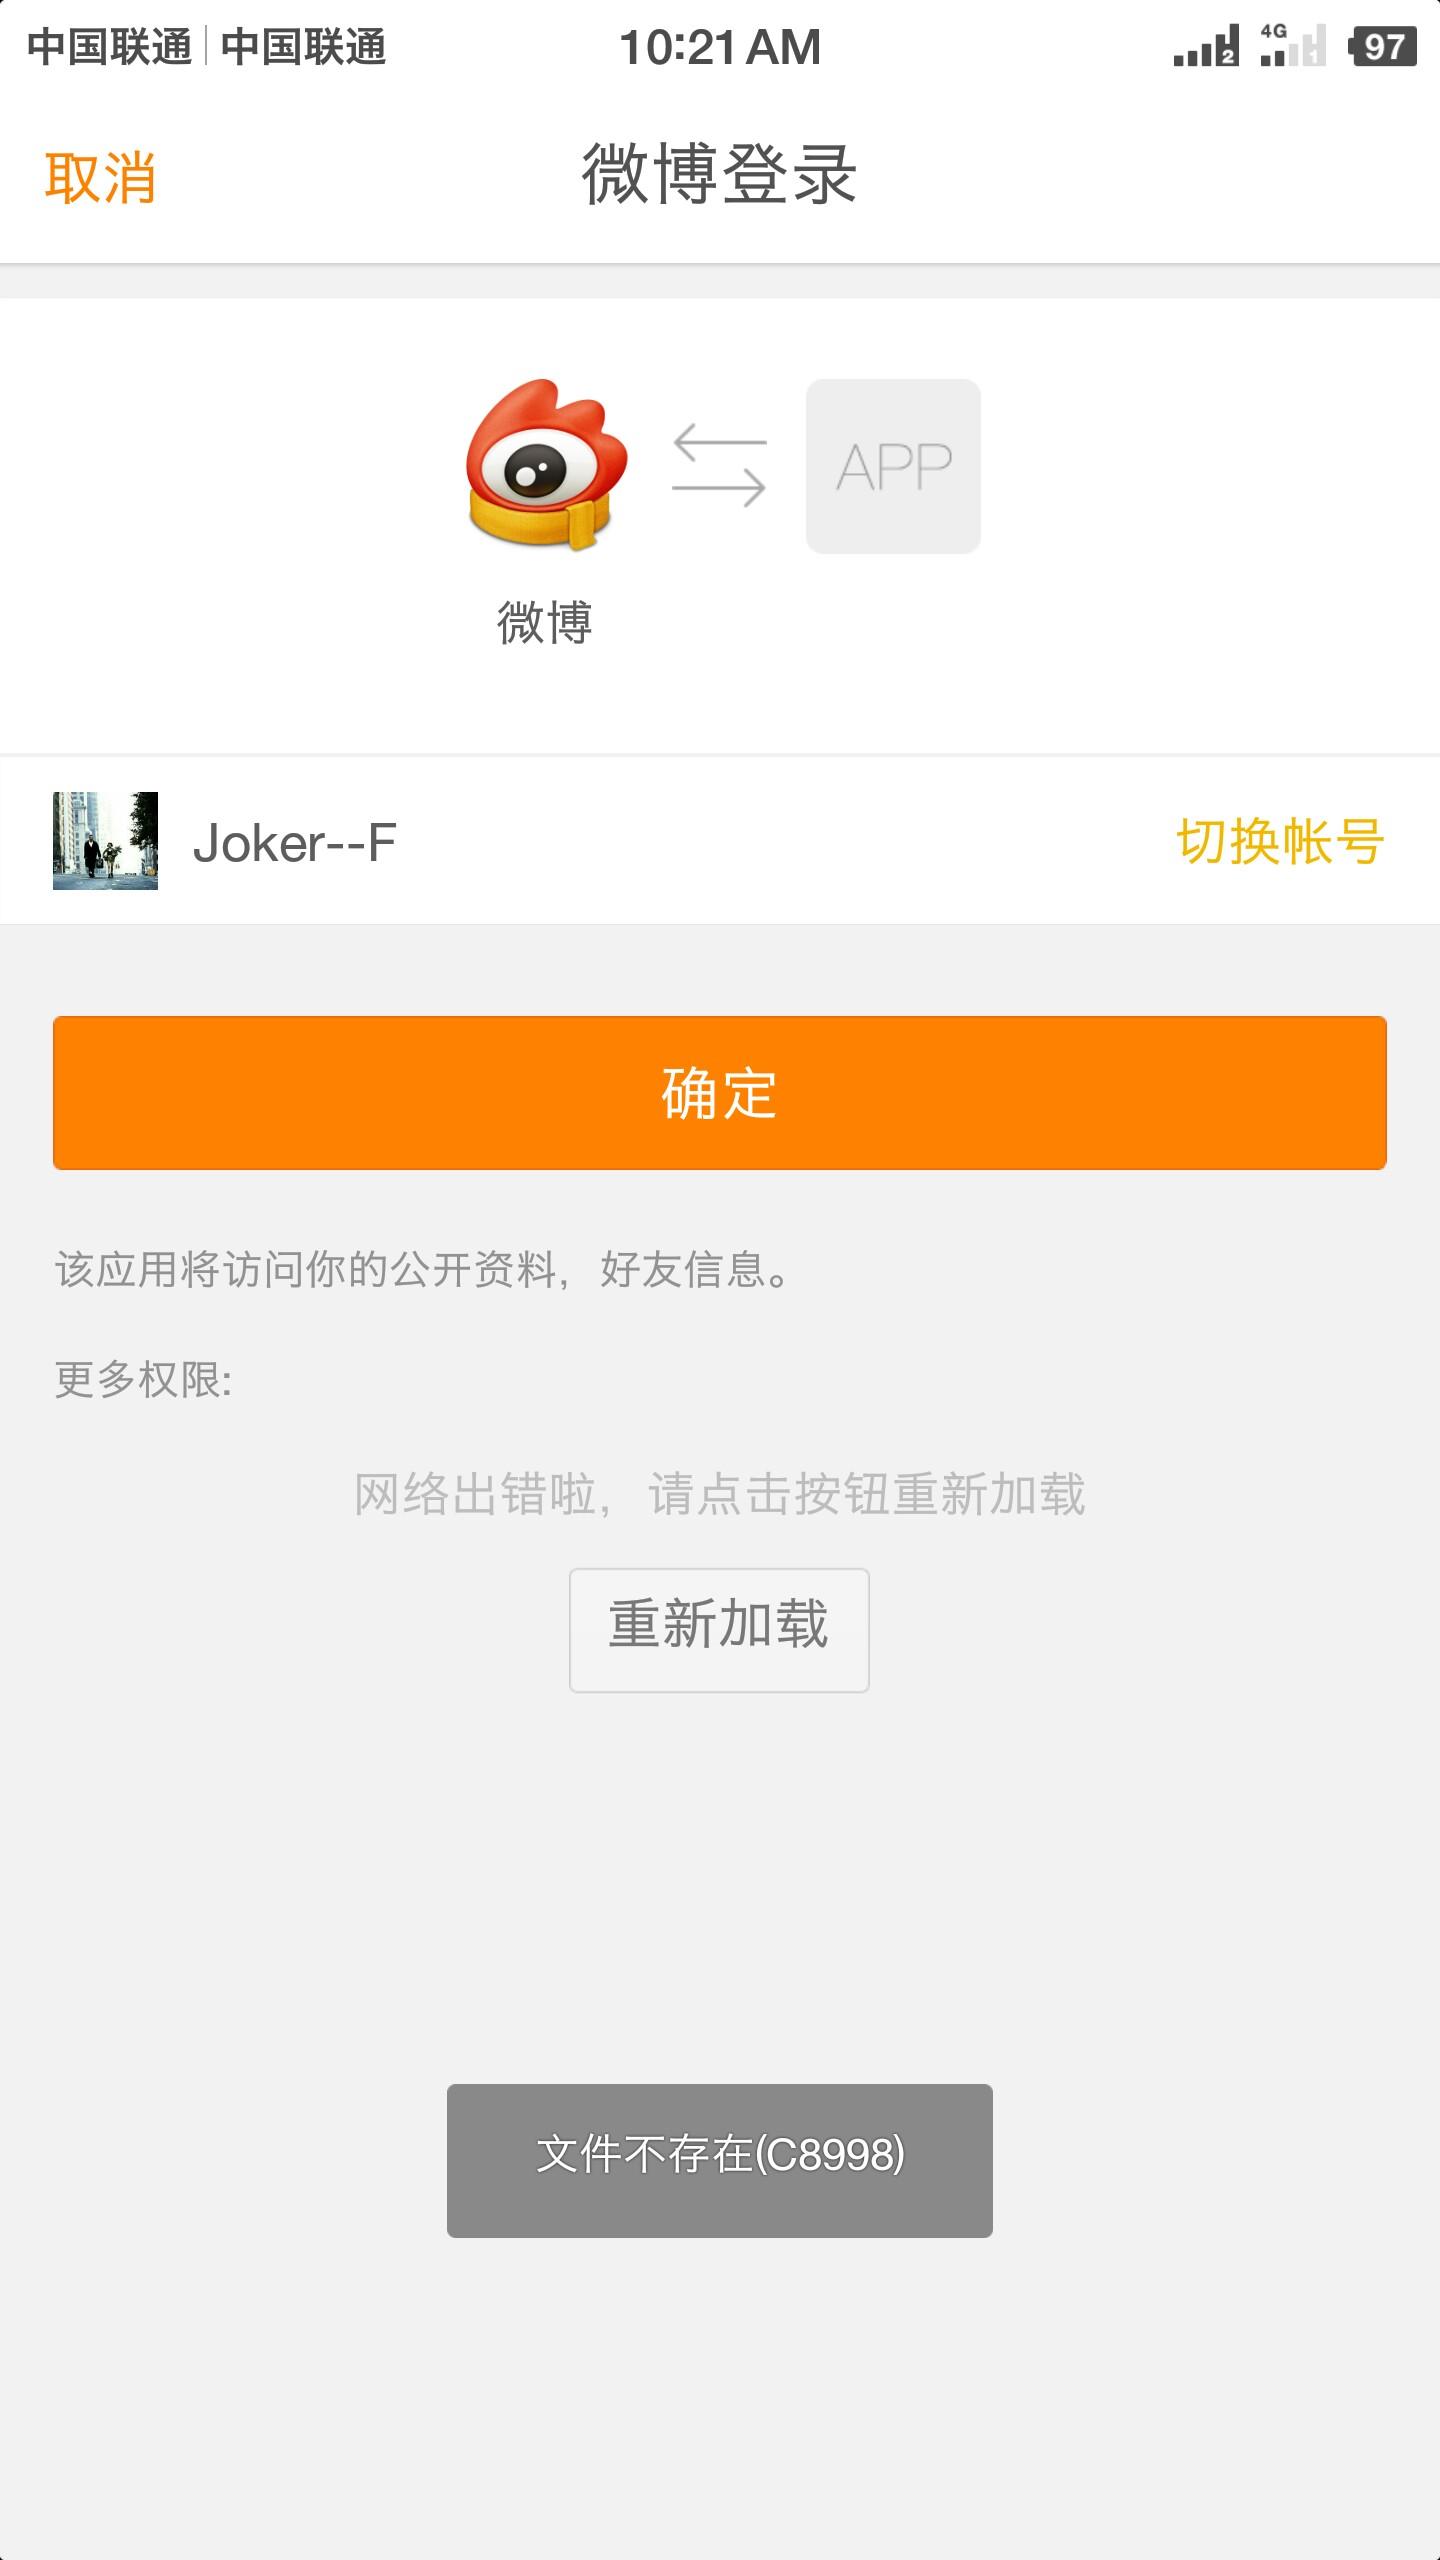 Screenshot_2016-12-07-10-21-04-493_Weico_compress.png